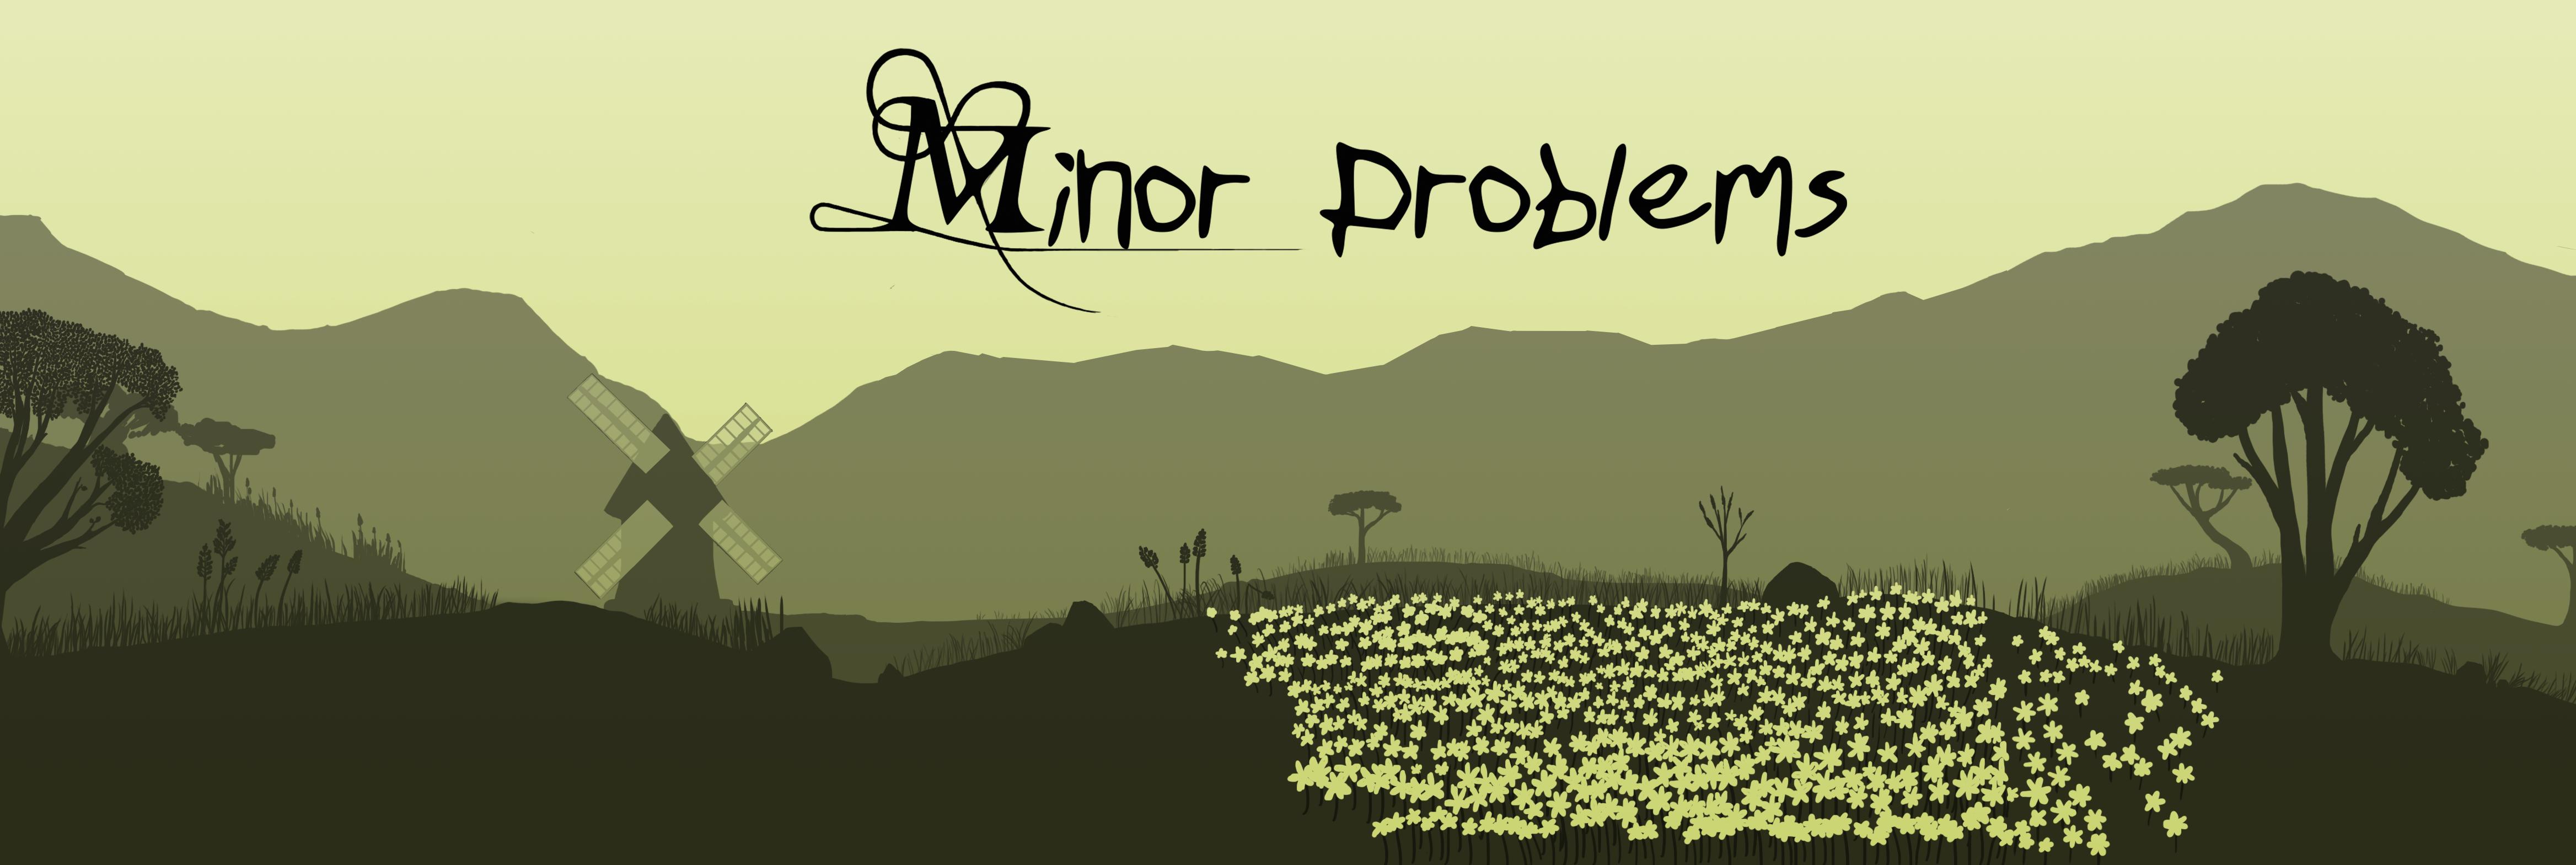 Minor Problems